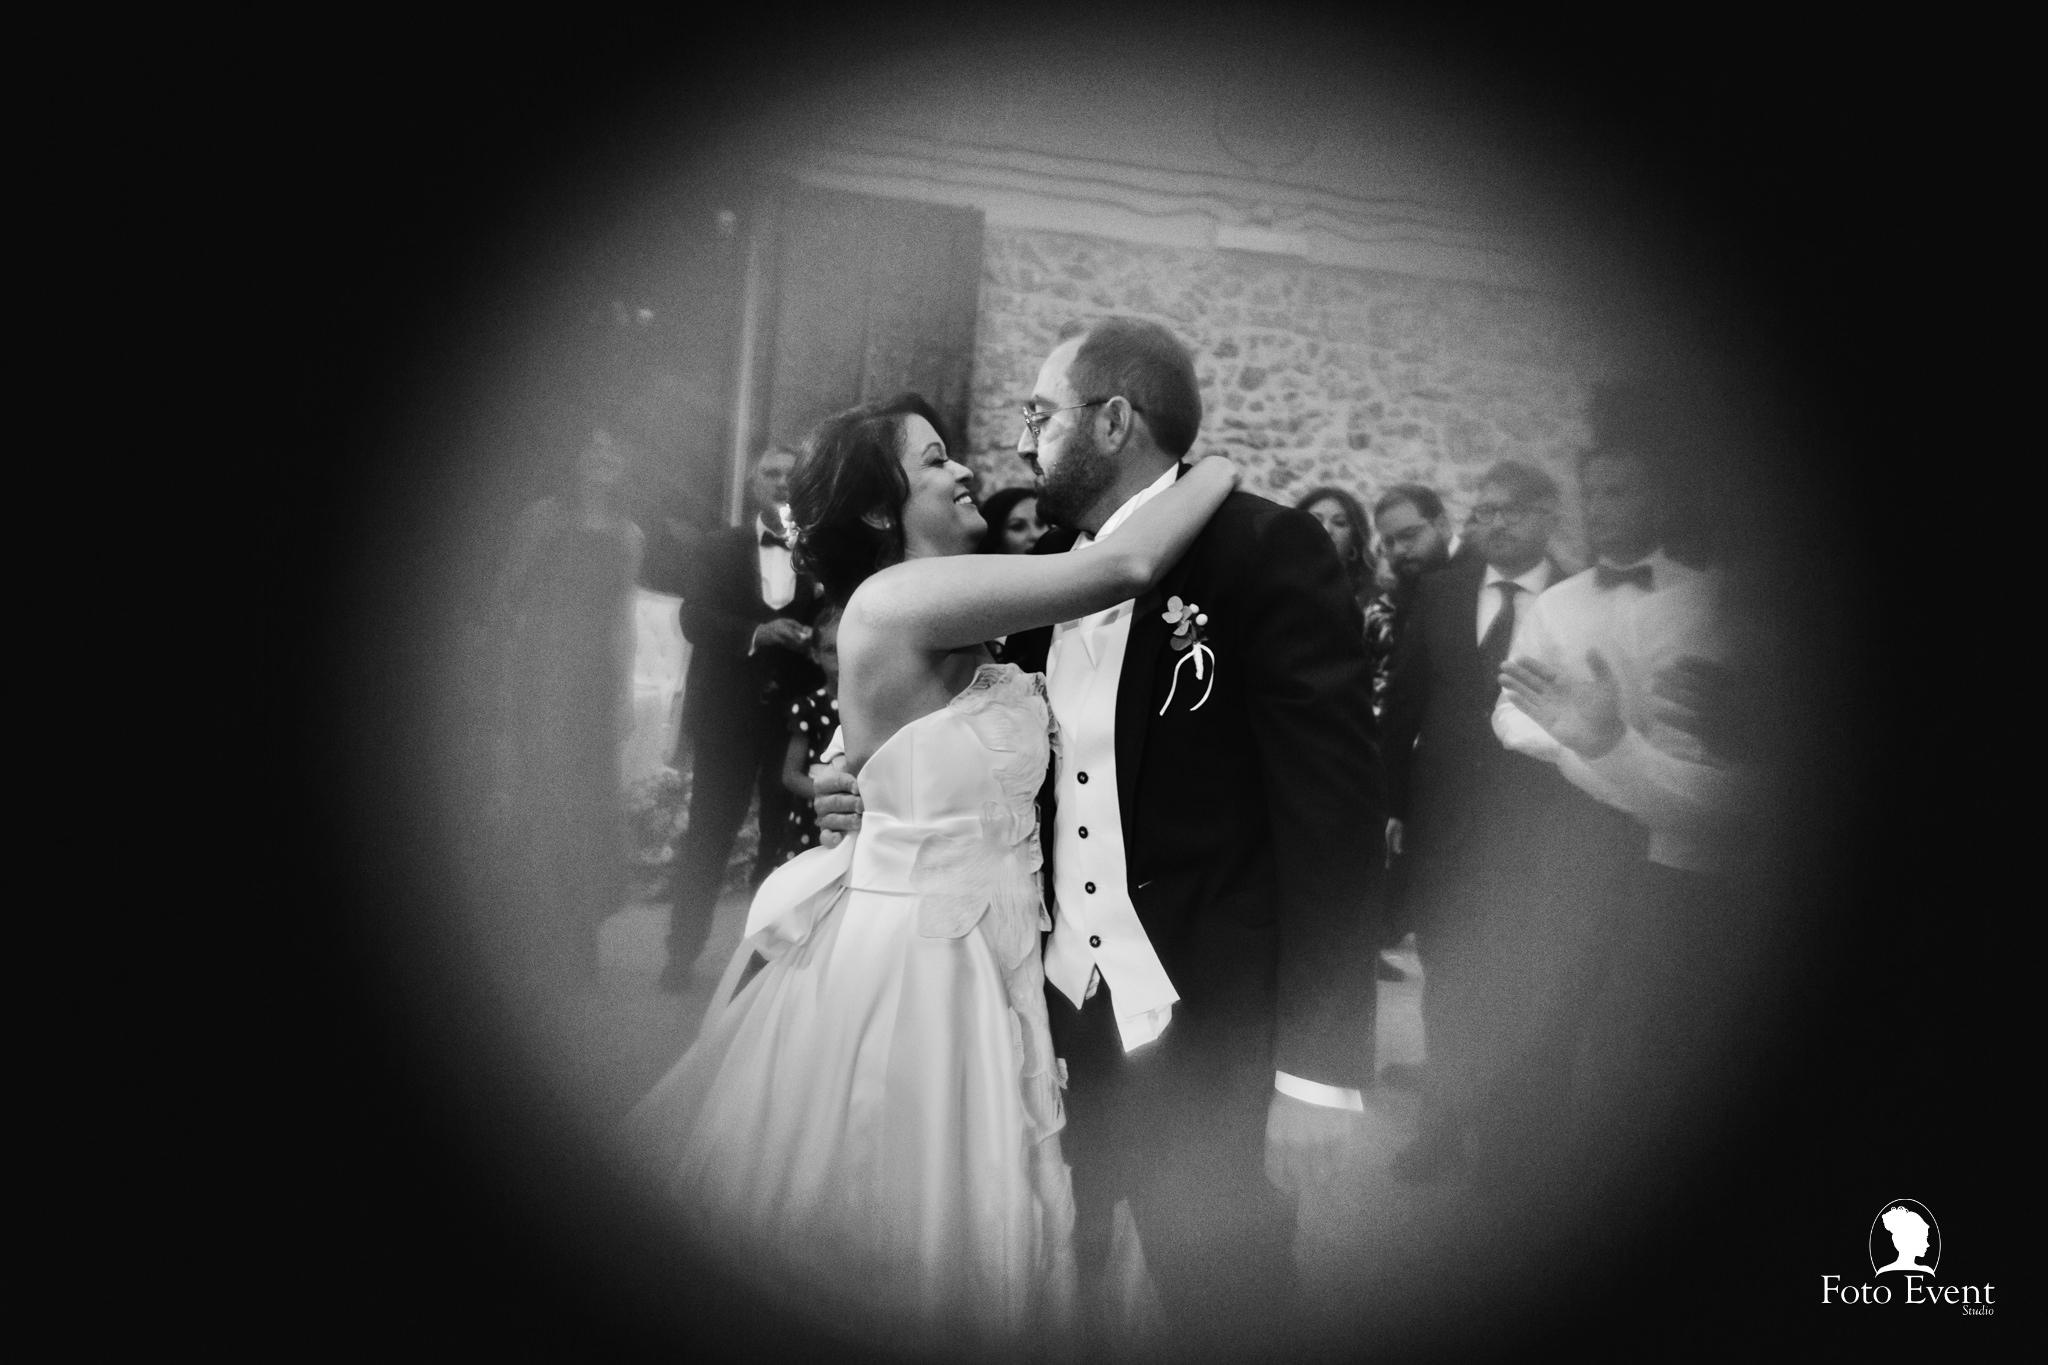 054-2020-10-15-Matrimonio-Noemi-e-Salvatore-Paterno-5DE-2154-Edit